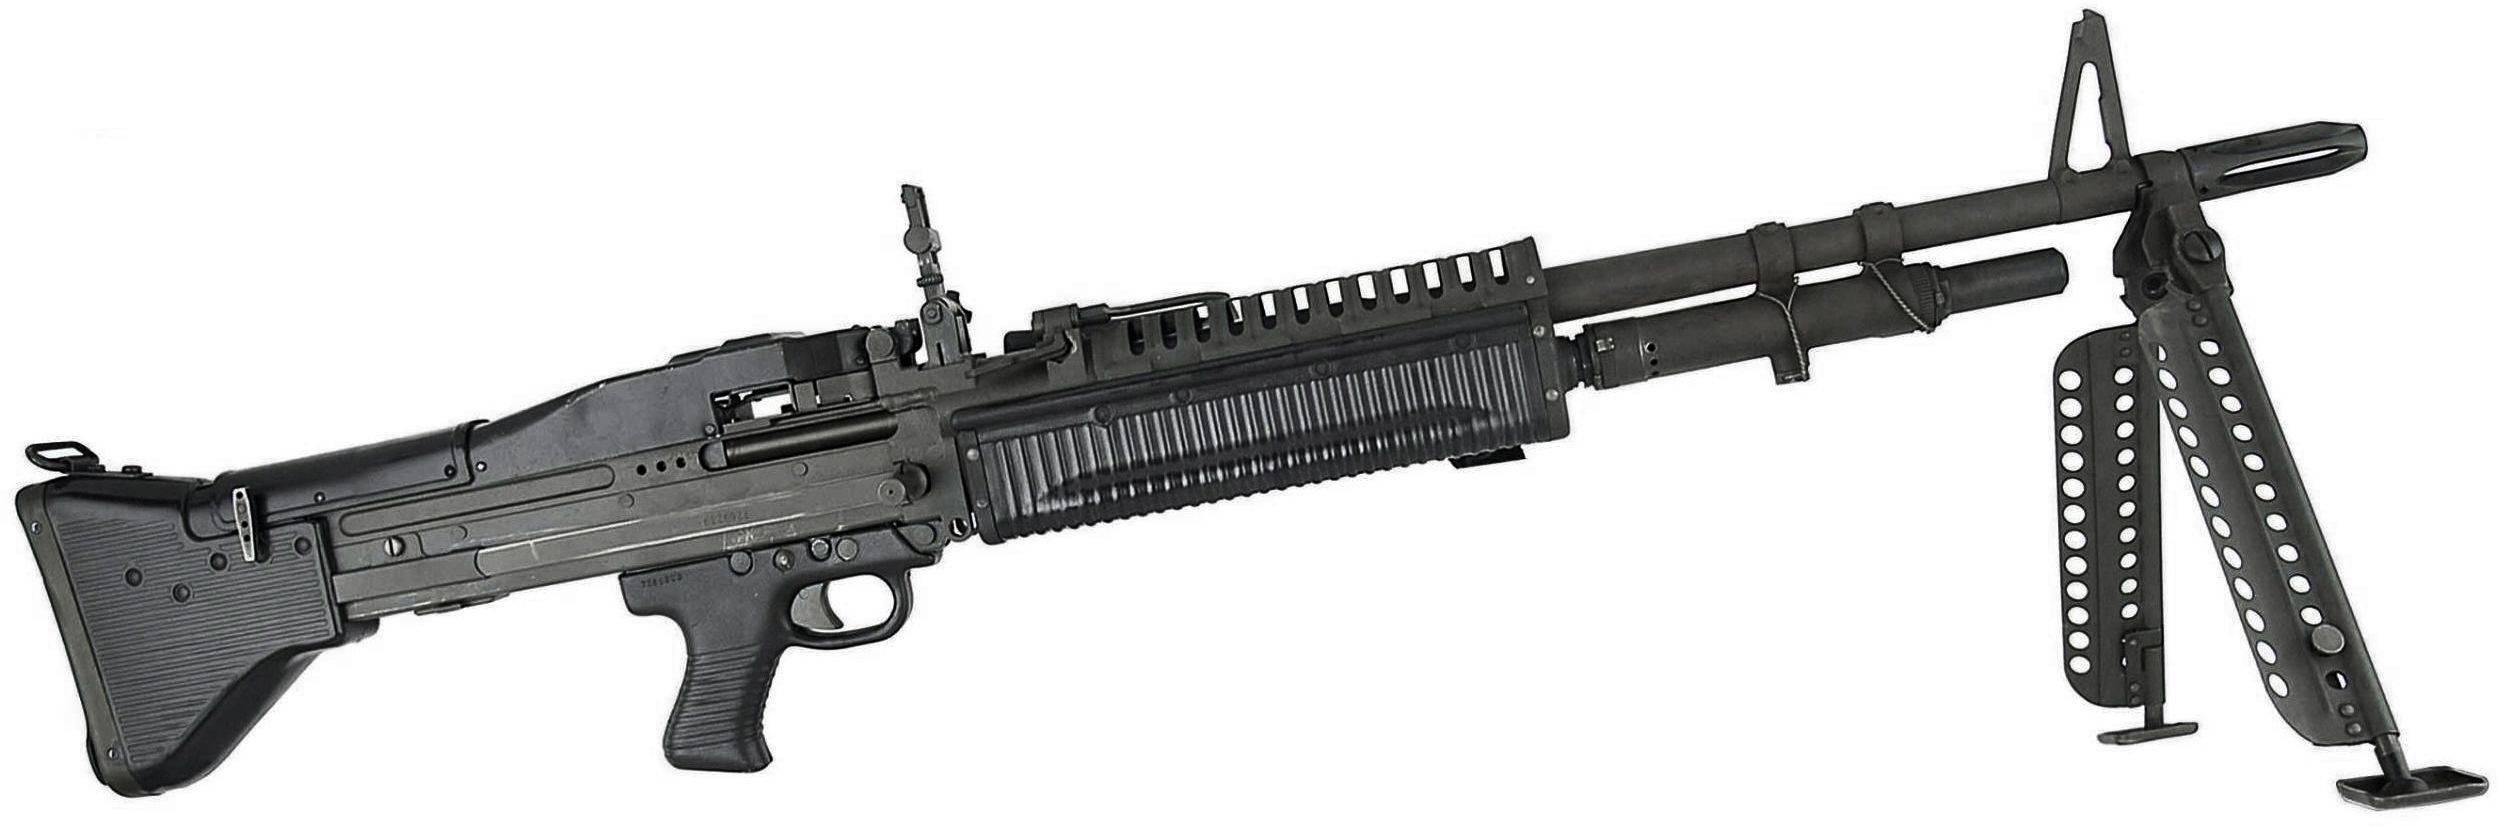 M60 (пулемёт) — википедия